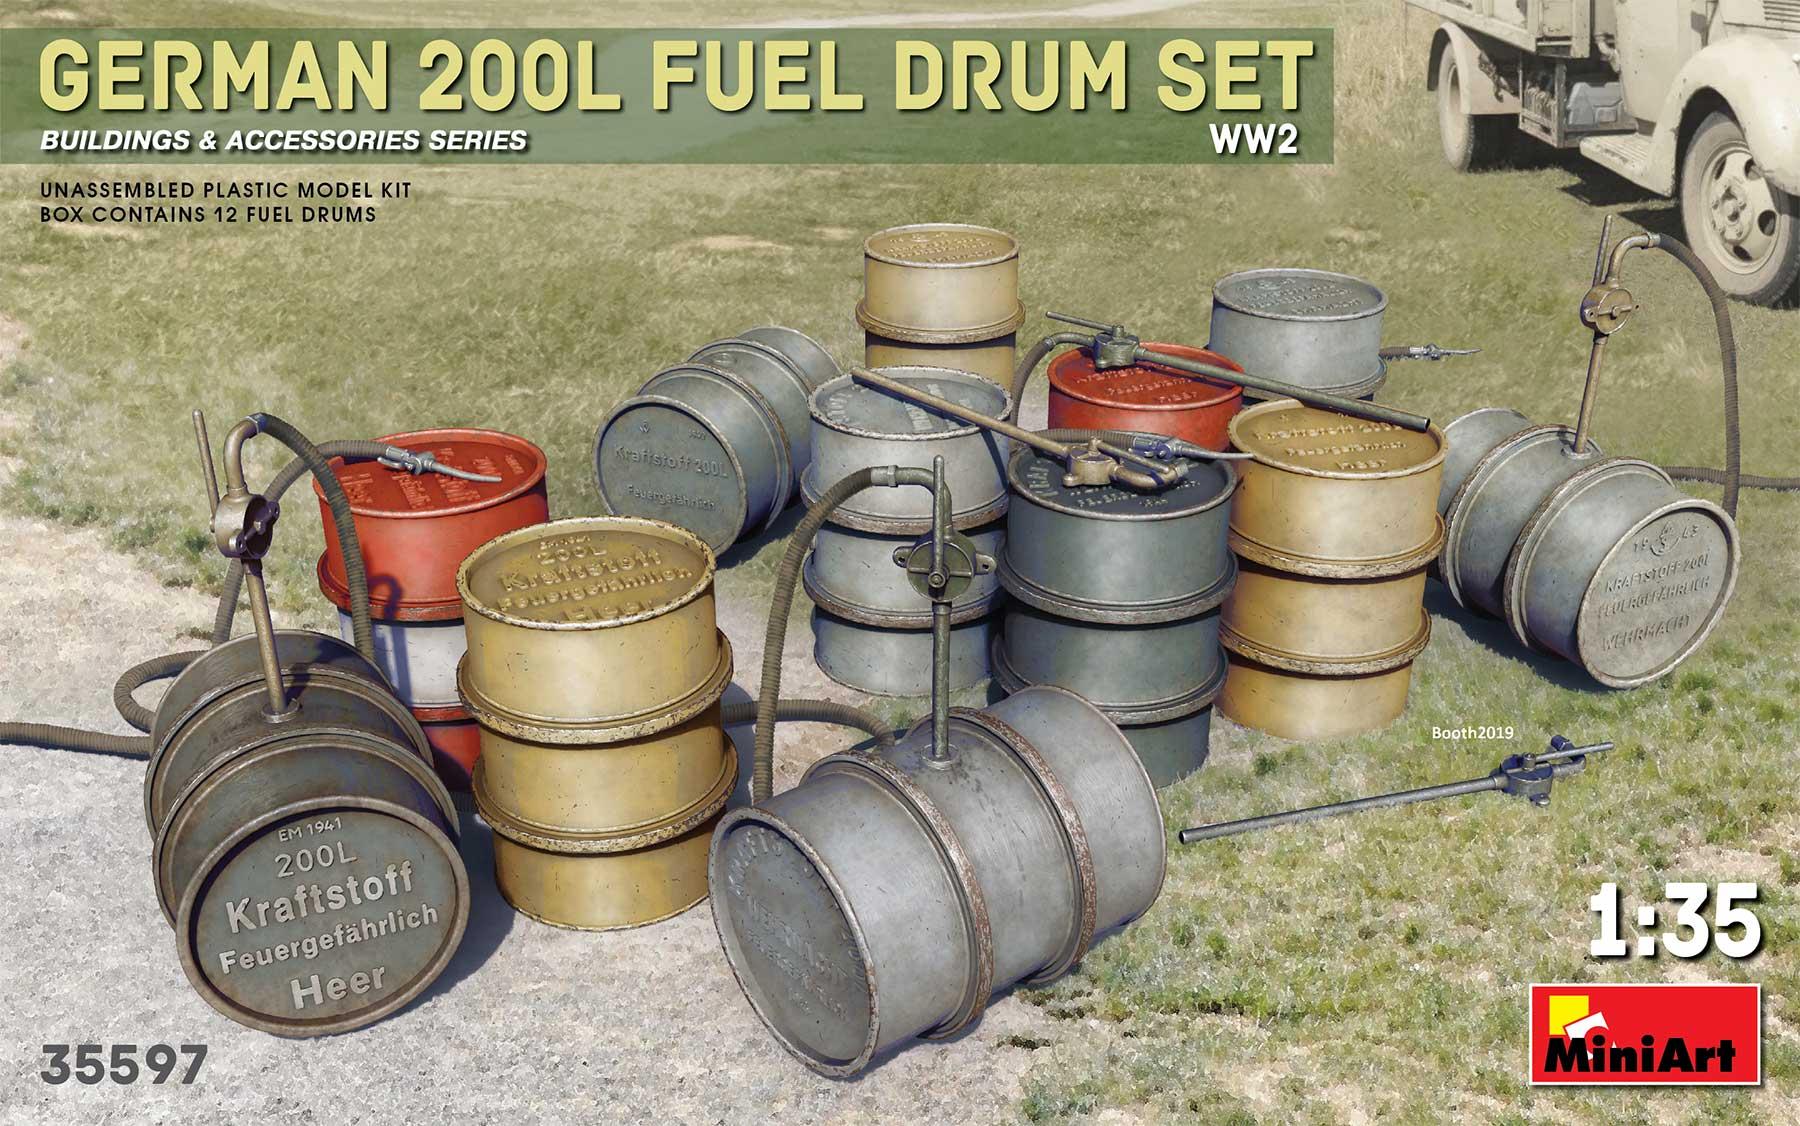 Fuel Filter-Original Performance WD EXPRESS 092 38017 501